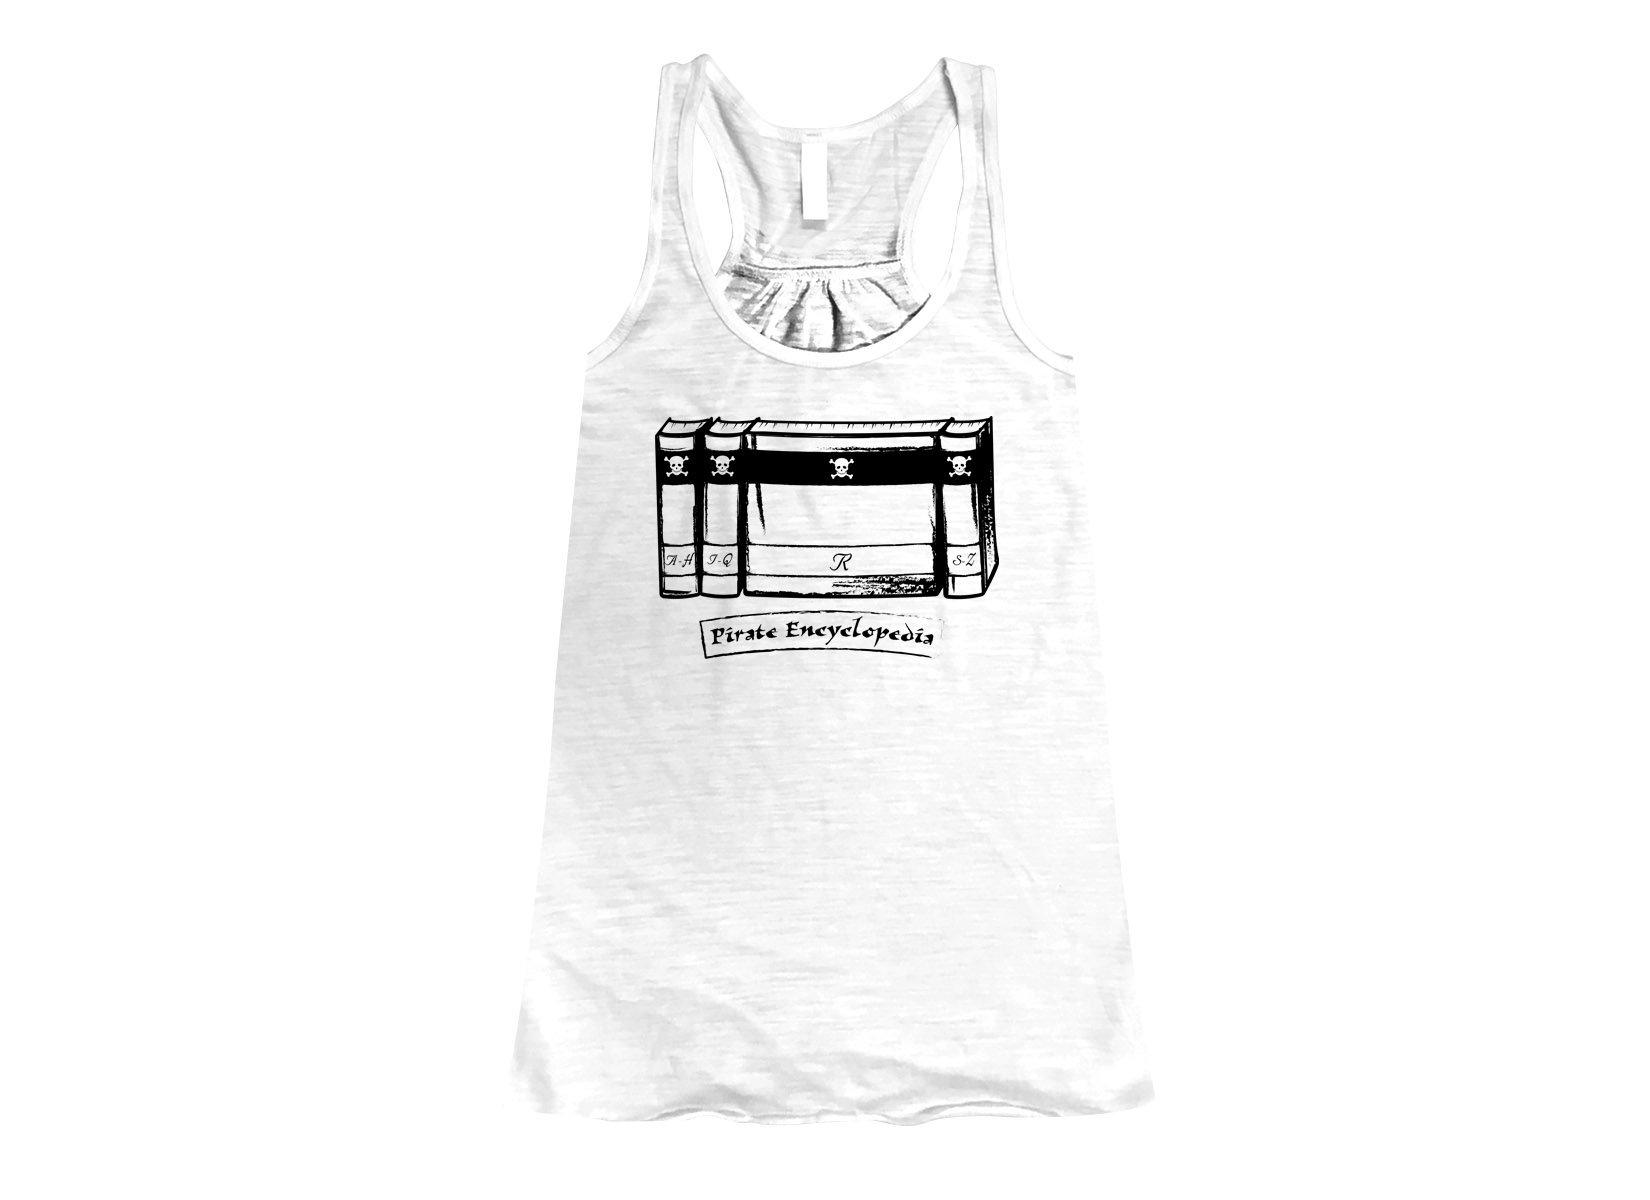 Pirate Encyclopedia on Womens Tanks T-Shirt